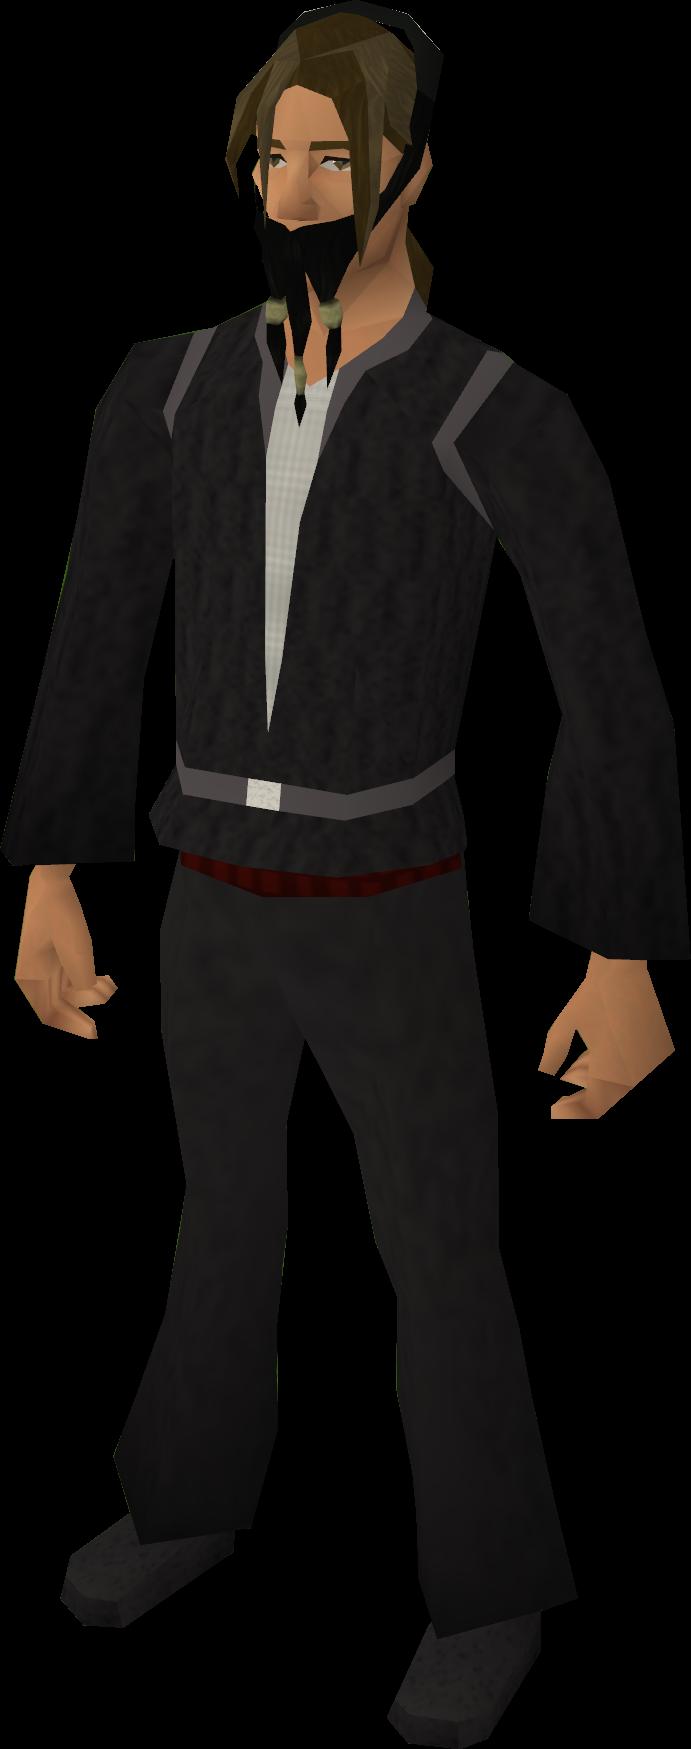 Fake Pirate Beard (black) Equipped.png - Pirate Beard PNG